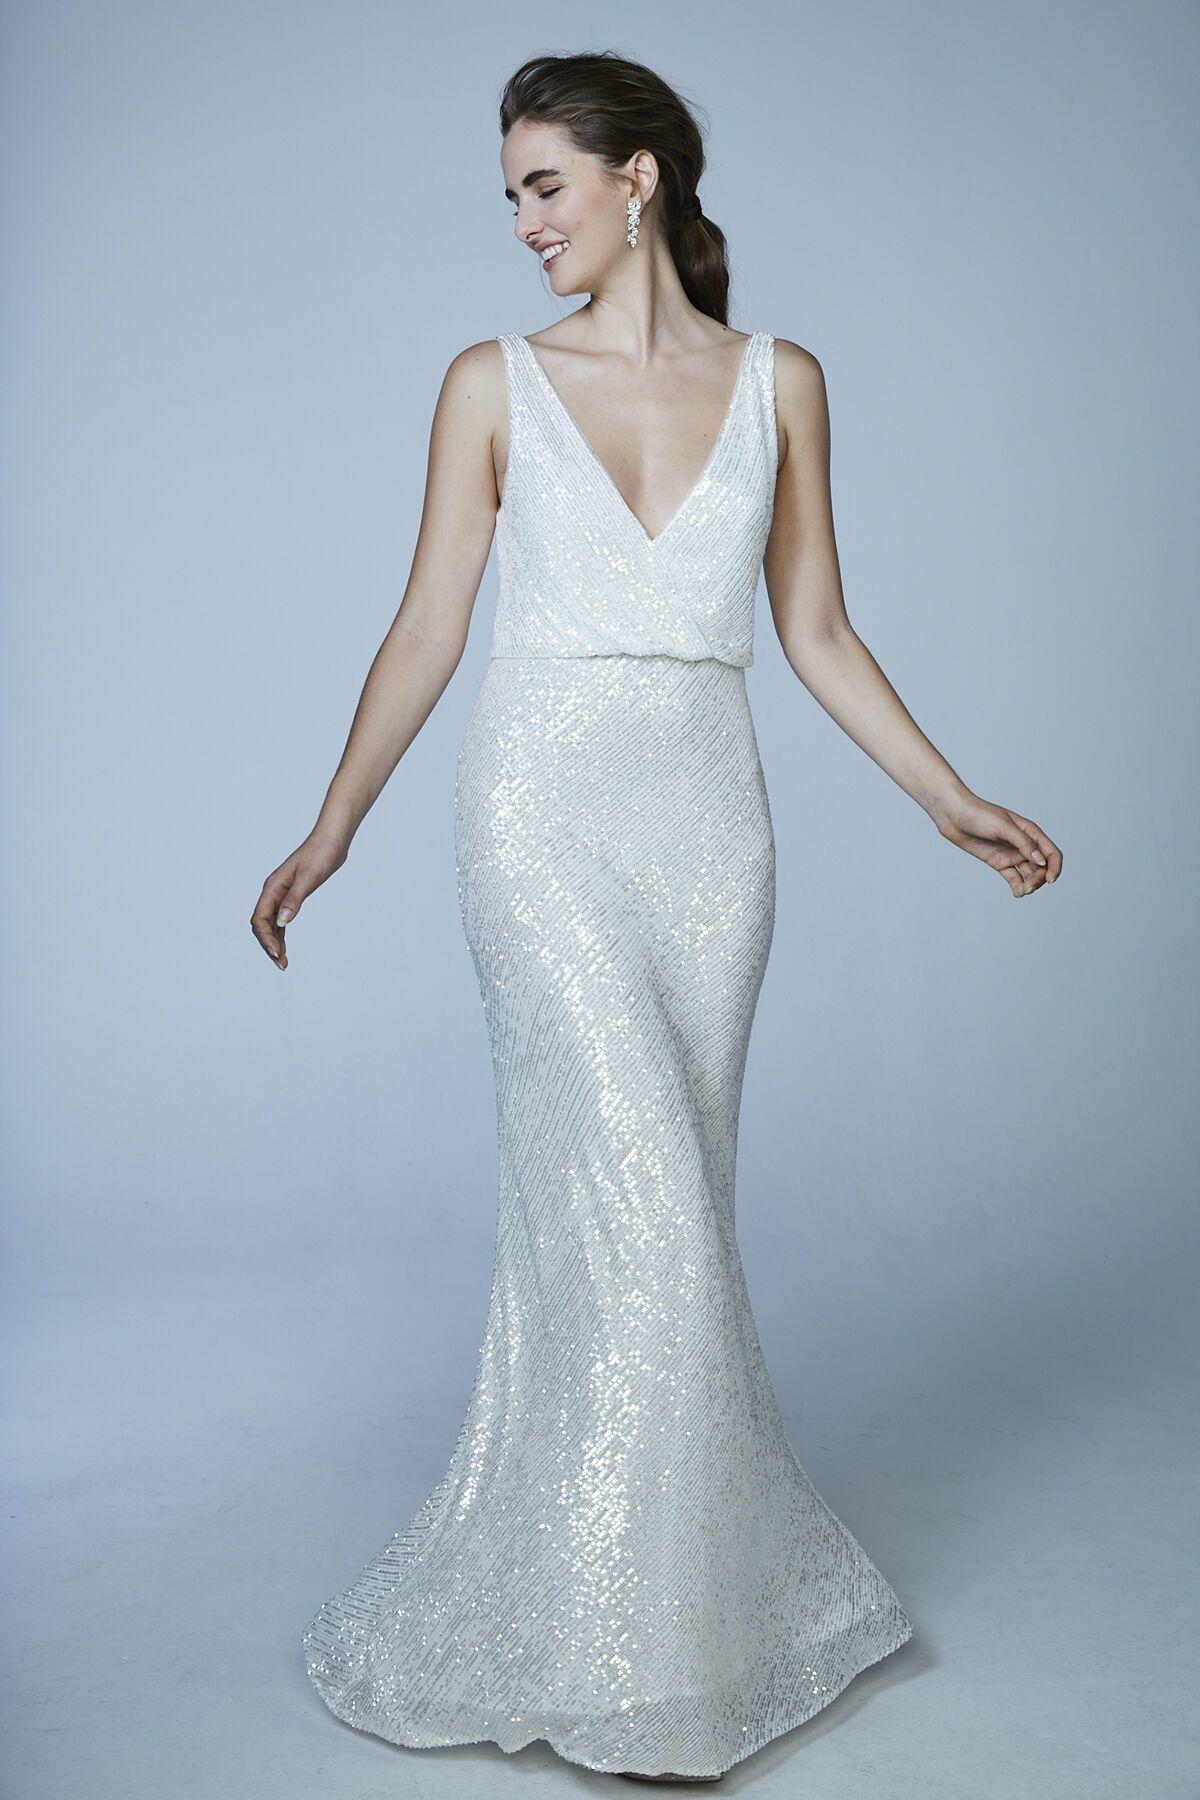 Bright Dress Bright Dress Dresses Affordable Wedding Dresses